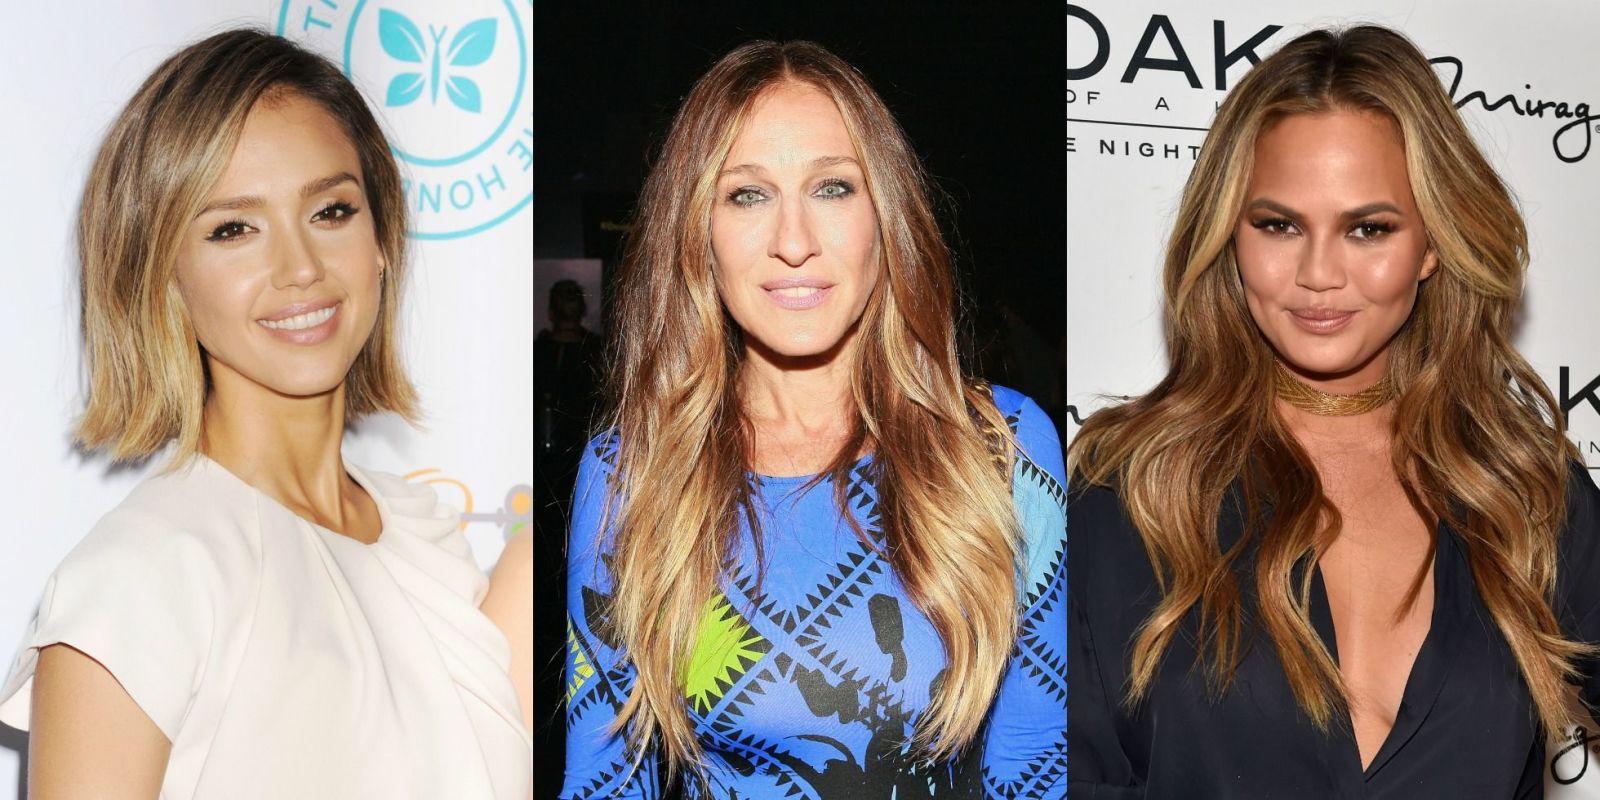 Bronde Hair Color Trend - Summer 2015 Bronde Hair Dye Pictures